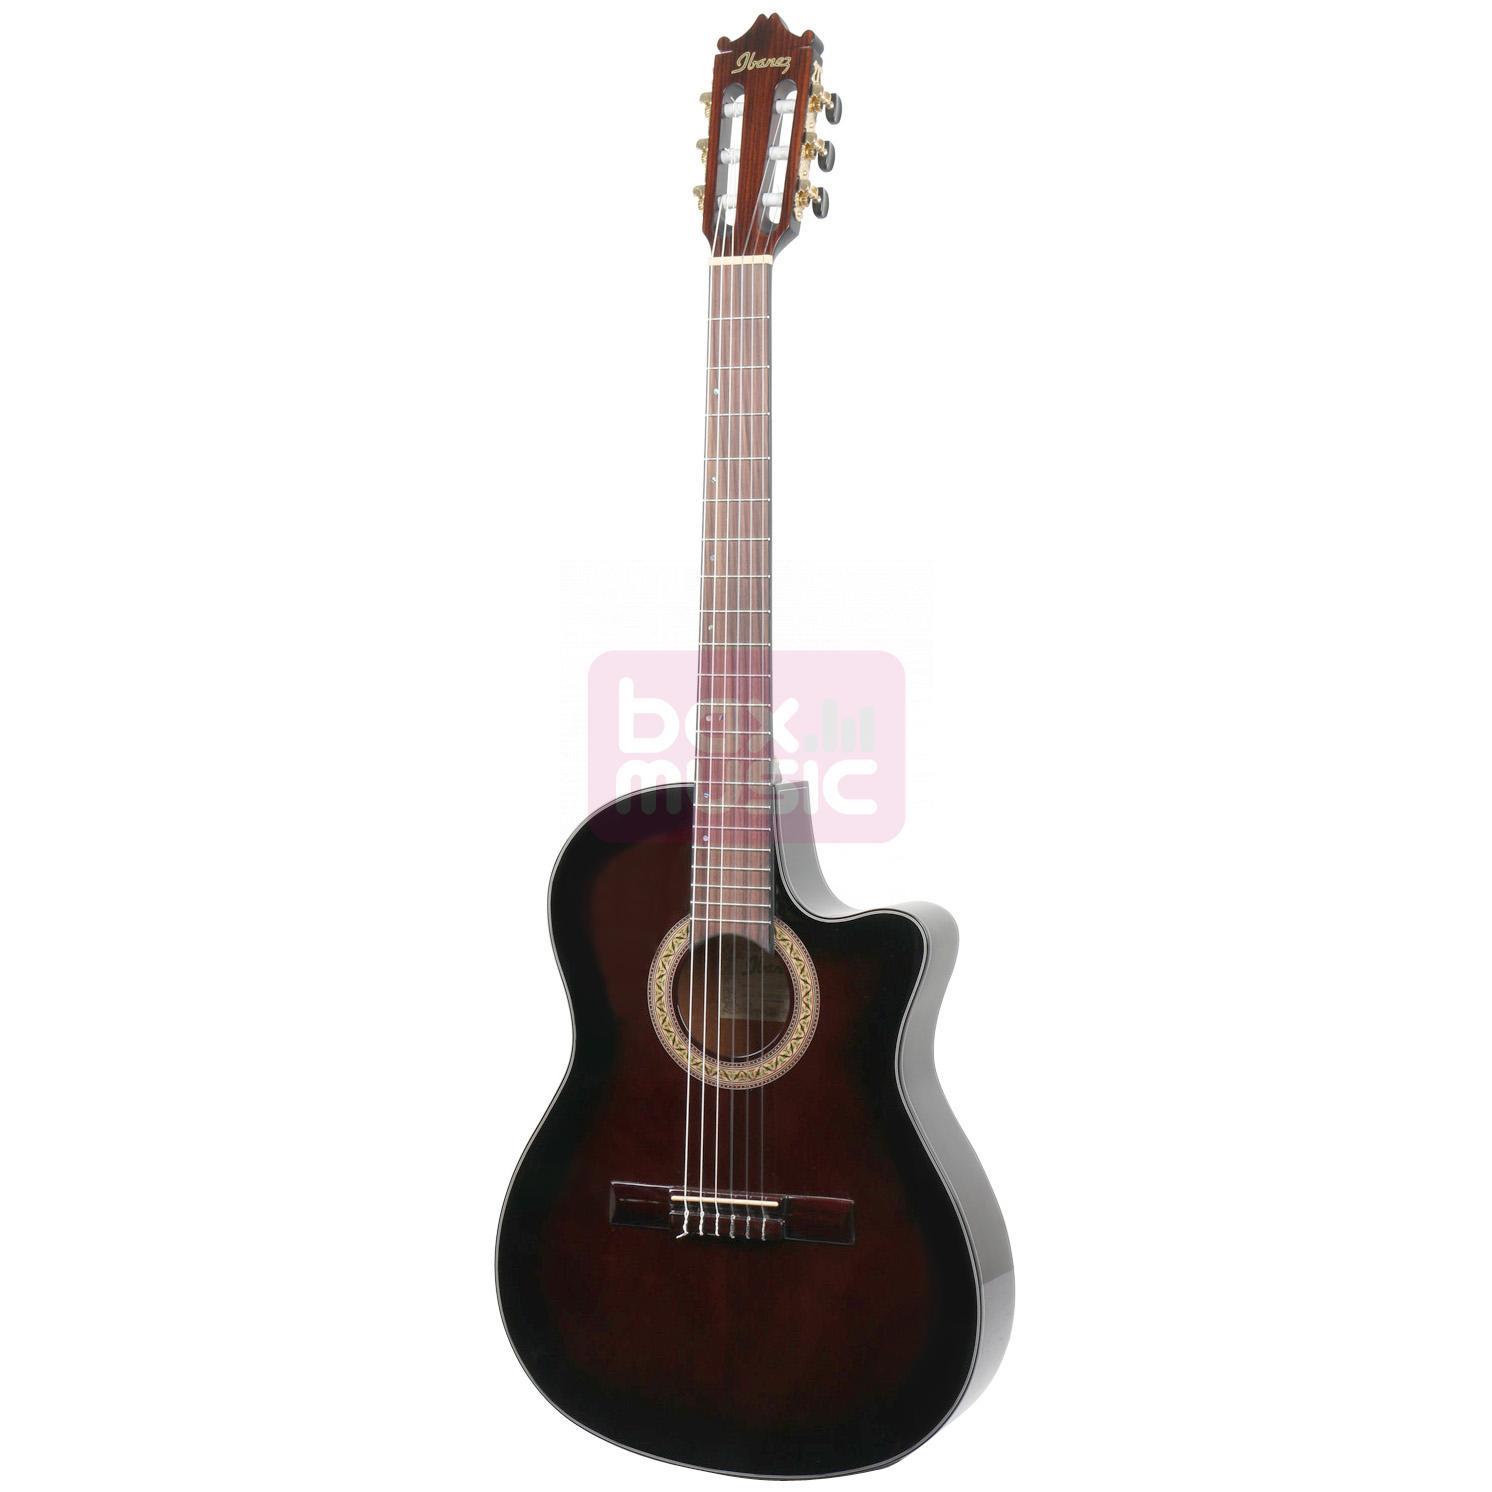 Ibanez GA35TCE Dark Violin Sunburst High Gloss